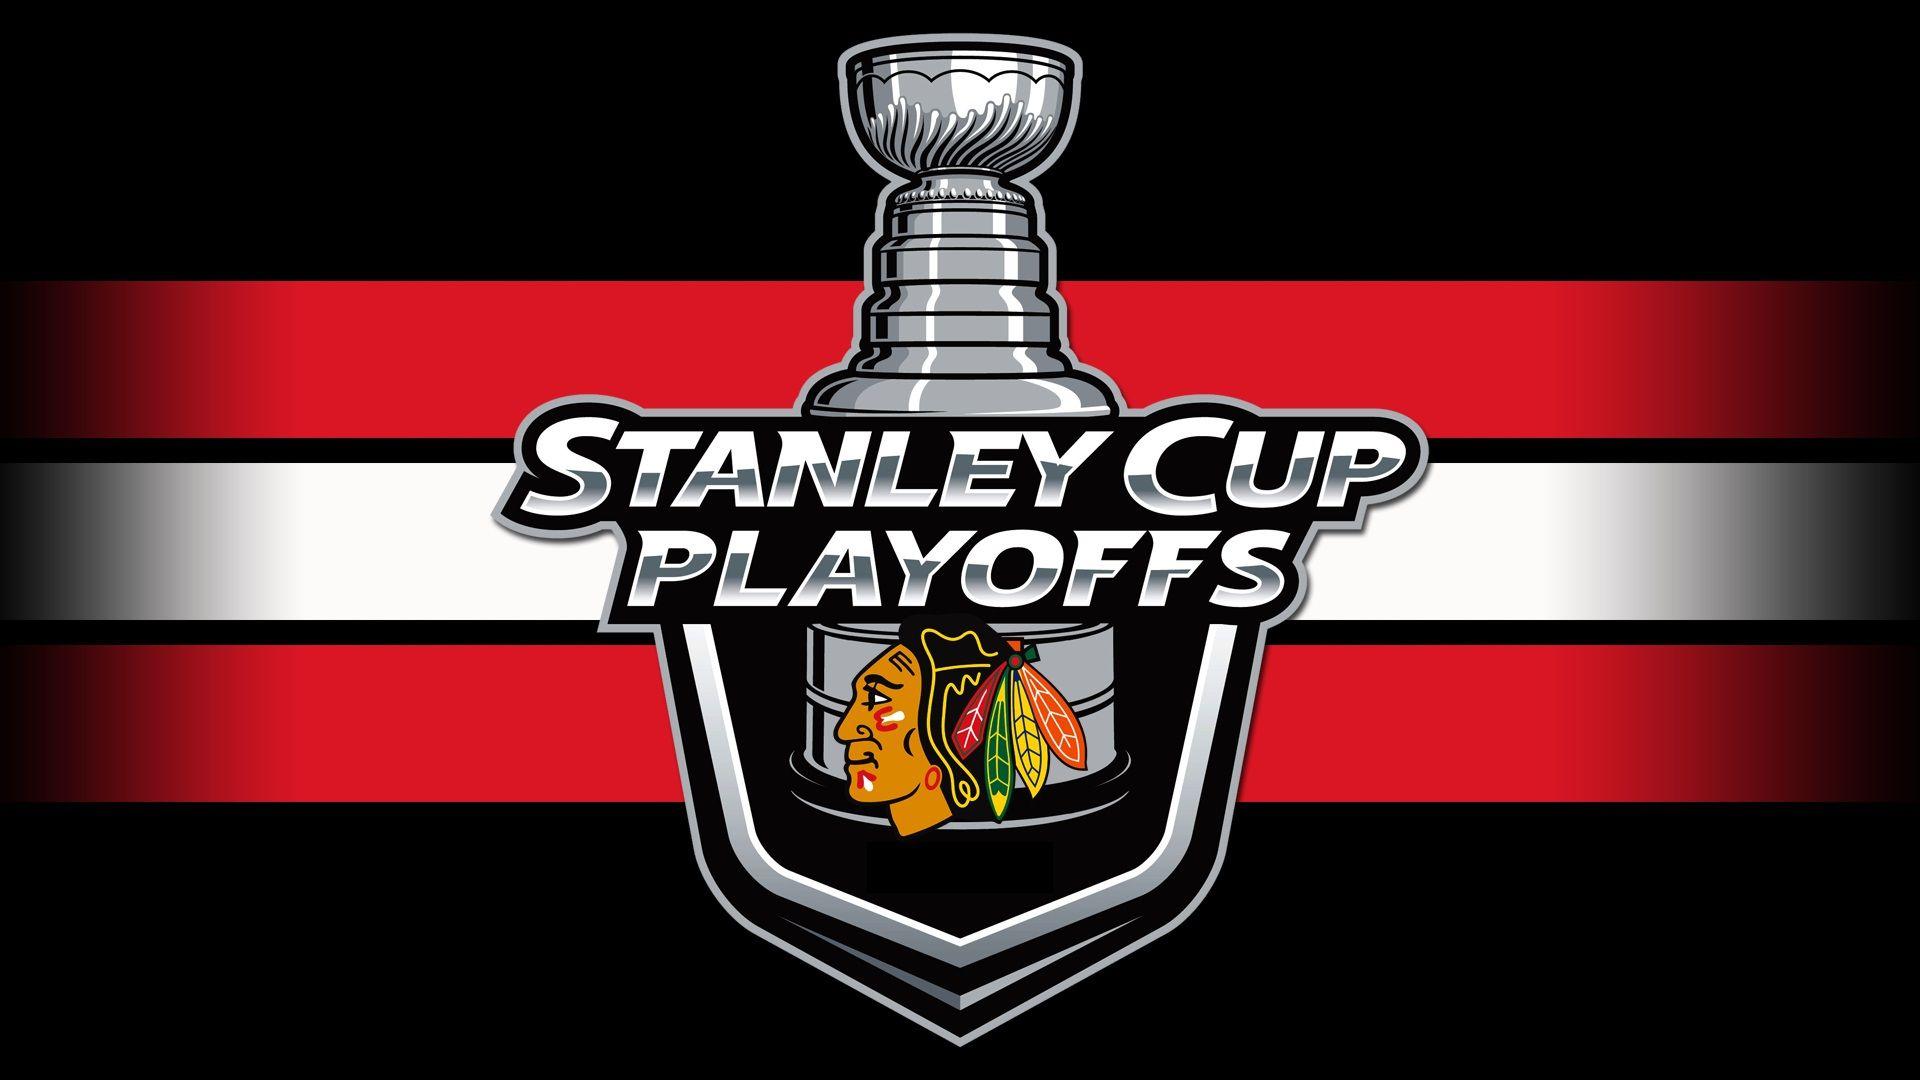 Live Wallpaper Hd Chicago Blackhawks Wallpaper Blackhawks Stanley Cup Chicago Blackhawks